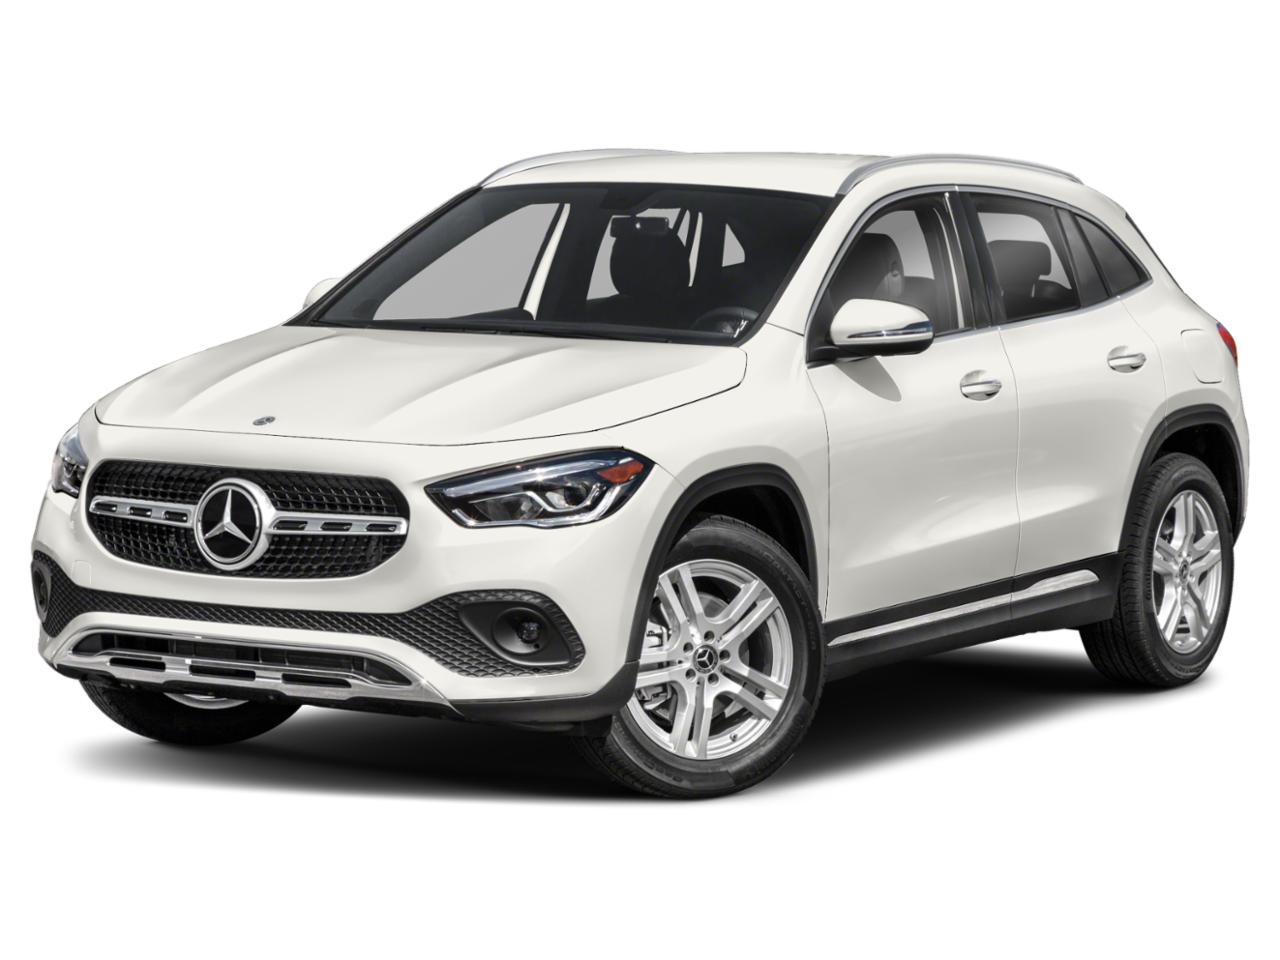 2021 Mercedes-Benz GLA Vehicle Photo in Appleton, WI 54913